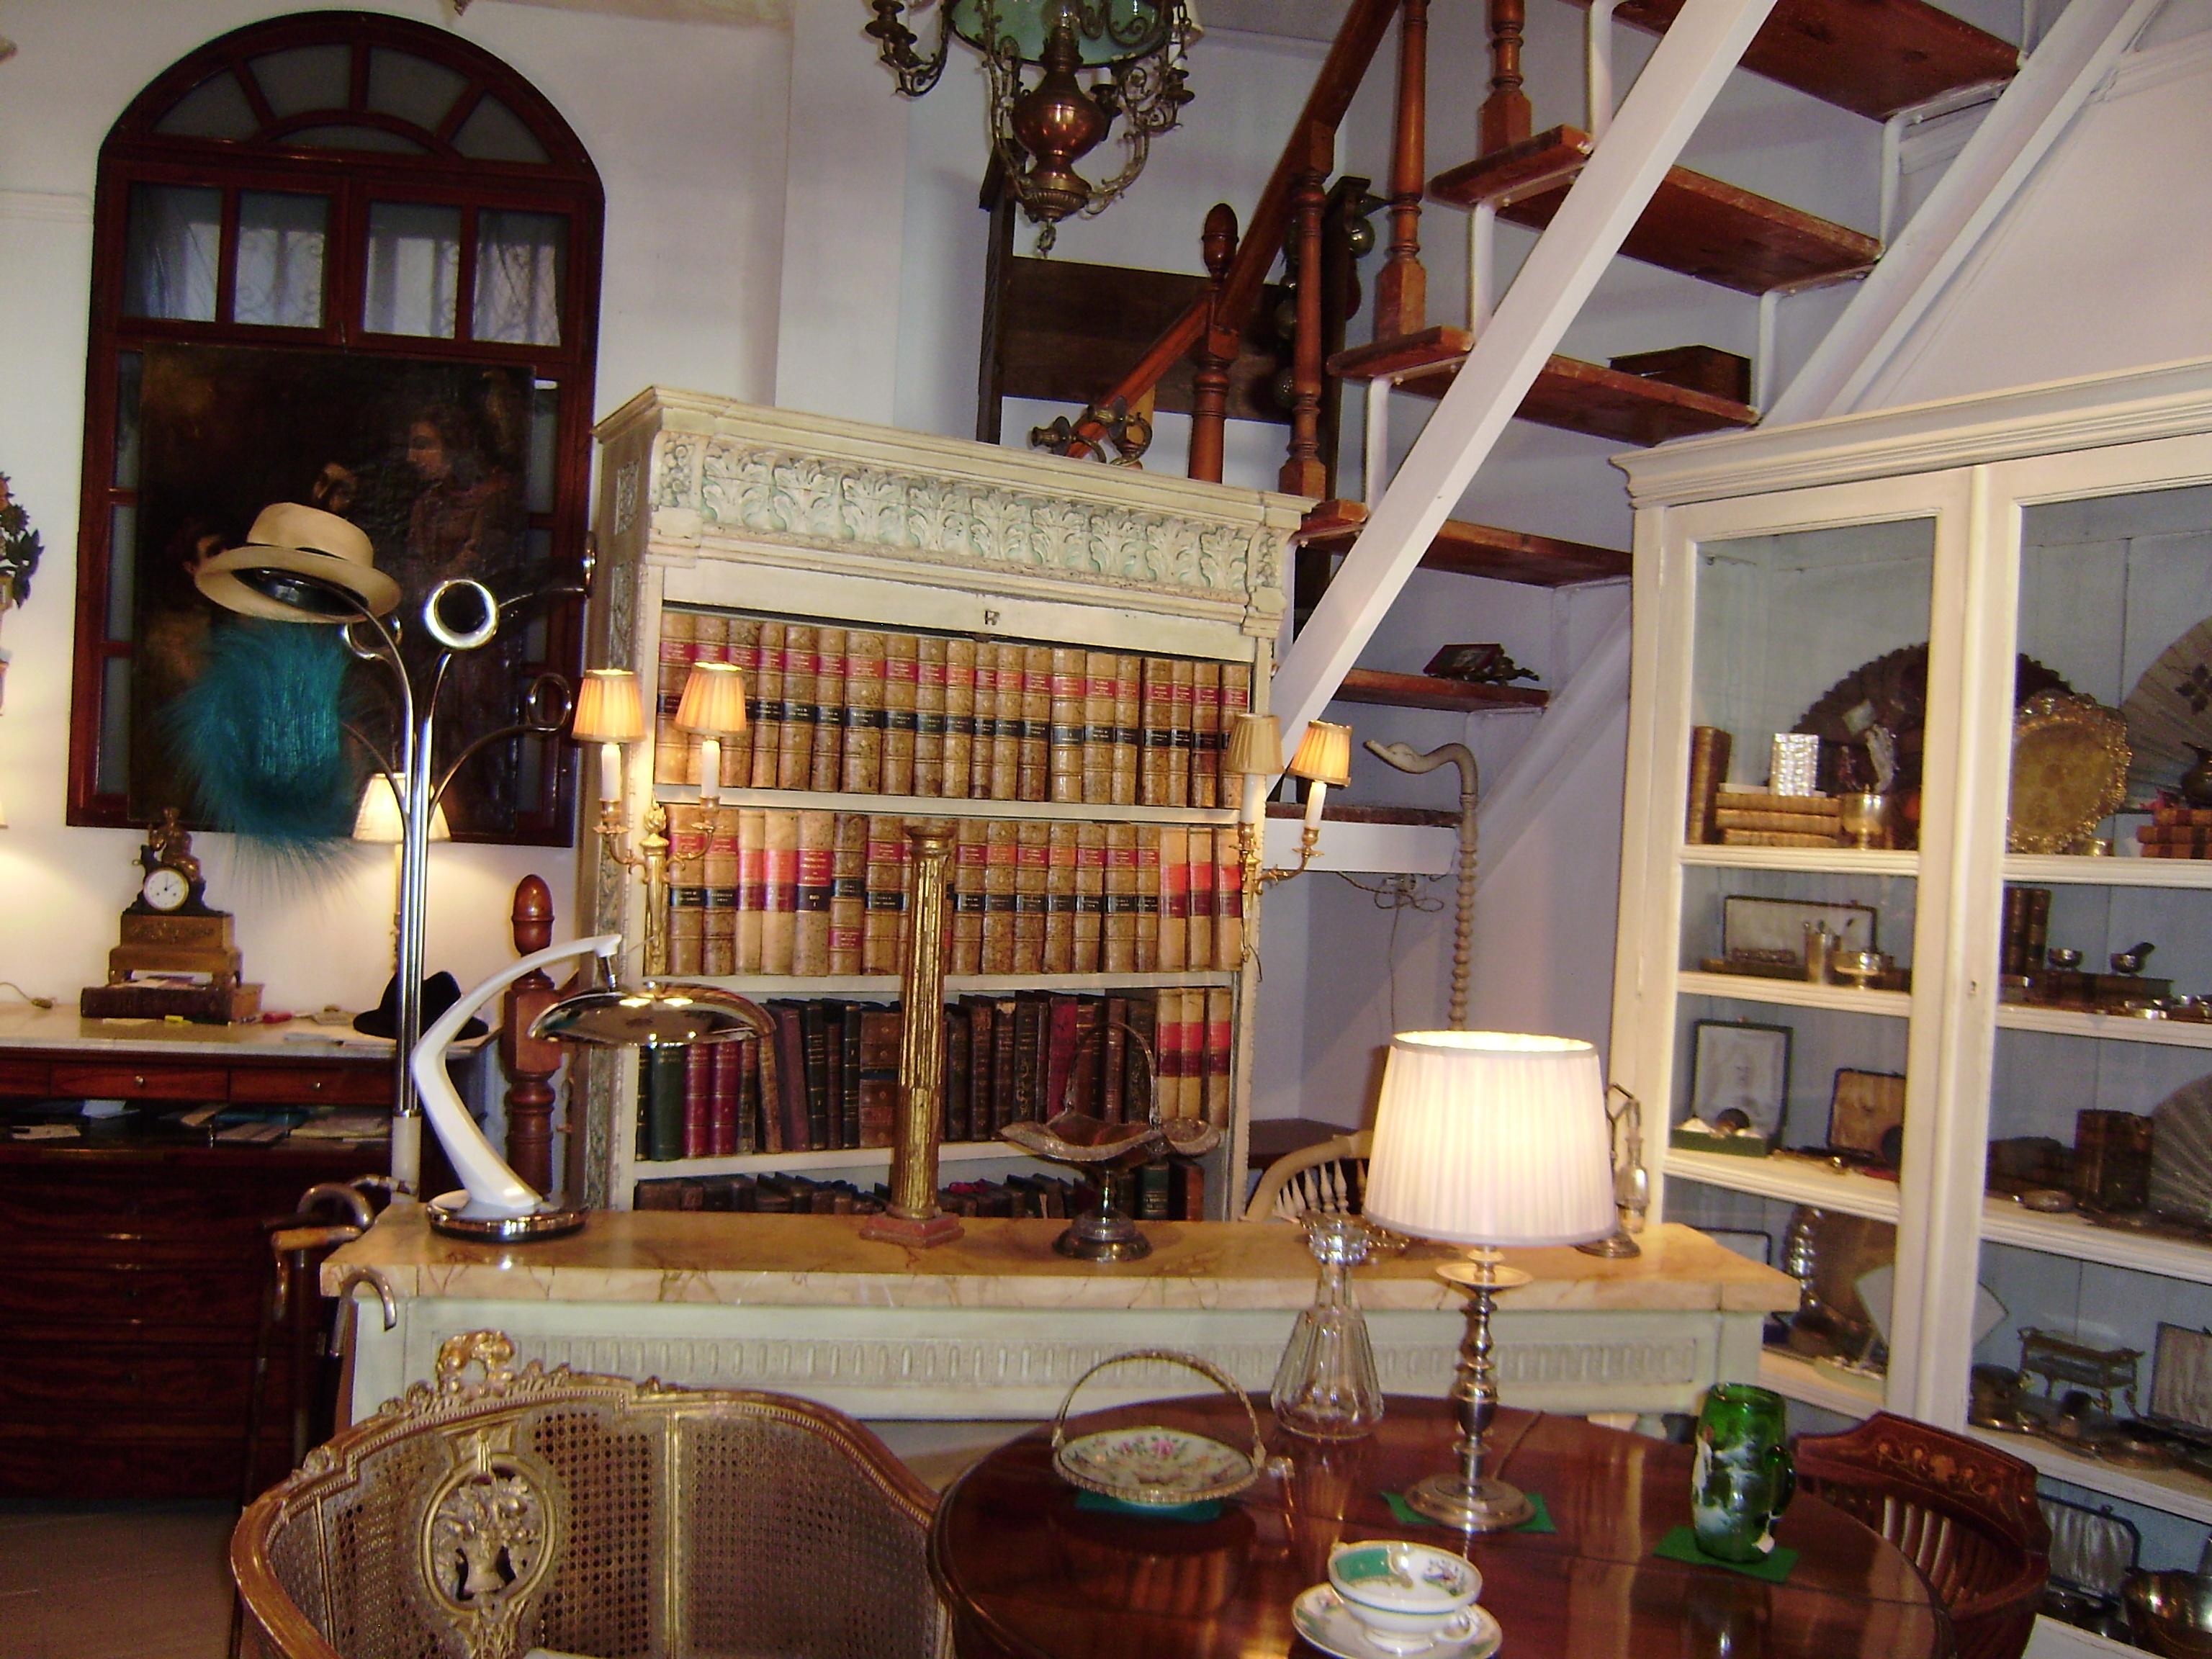 Rastro de muebles muebles rastro reto obtenga ideas dise o de muebles para - Remar muebles madrid ...